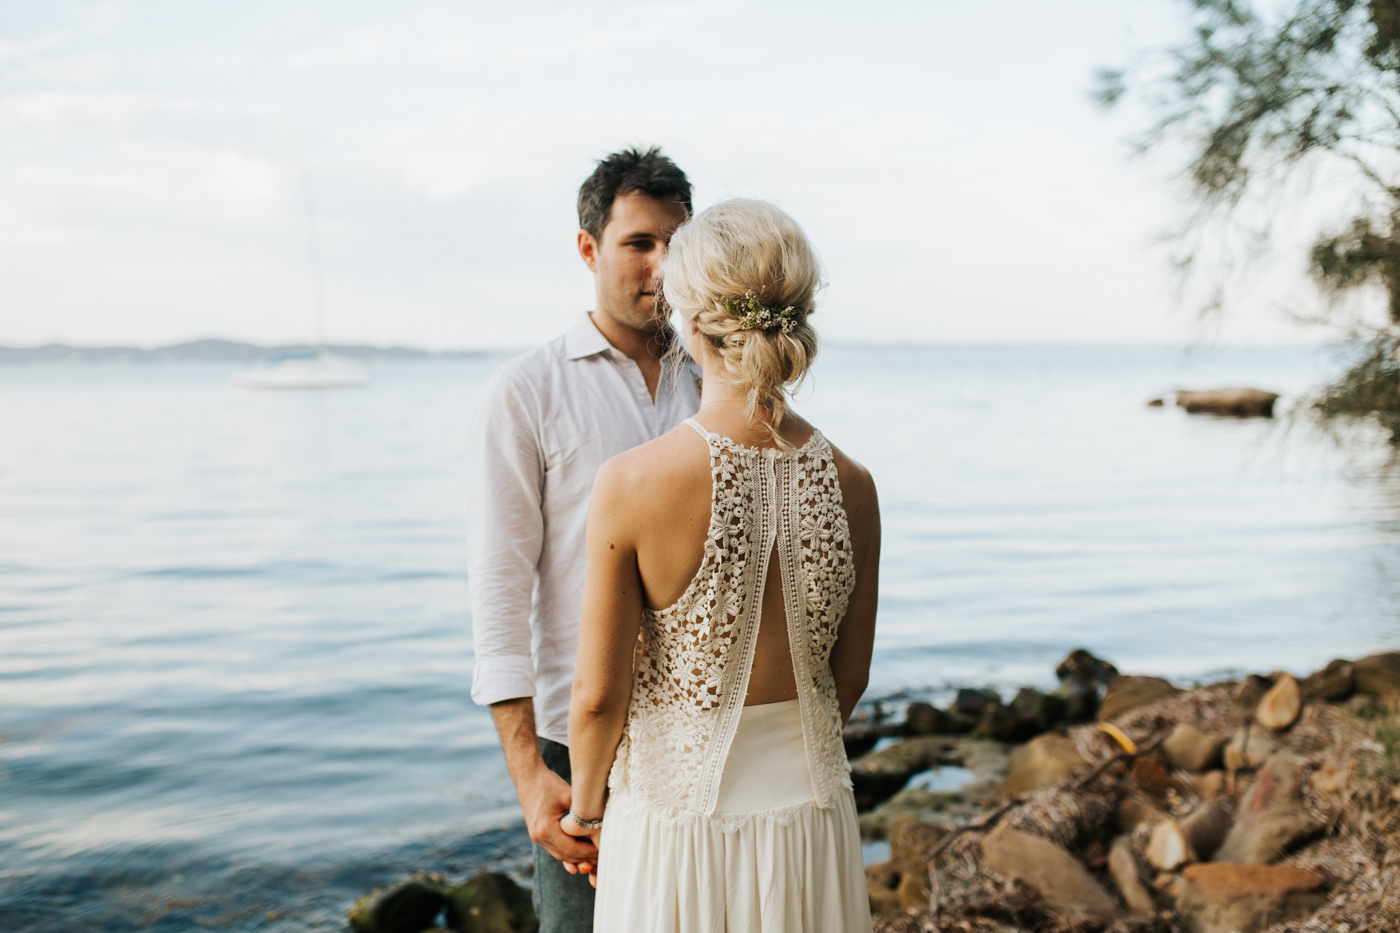 Emma & Ben - Lake Macquarie - Hunter Valley Wedding - Samantha Heather Photography-197.jpg